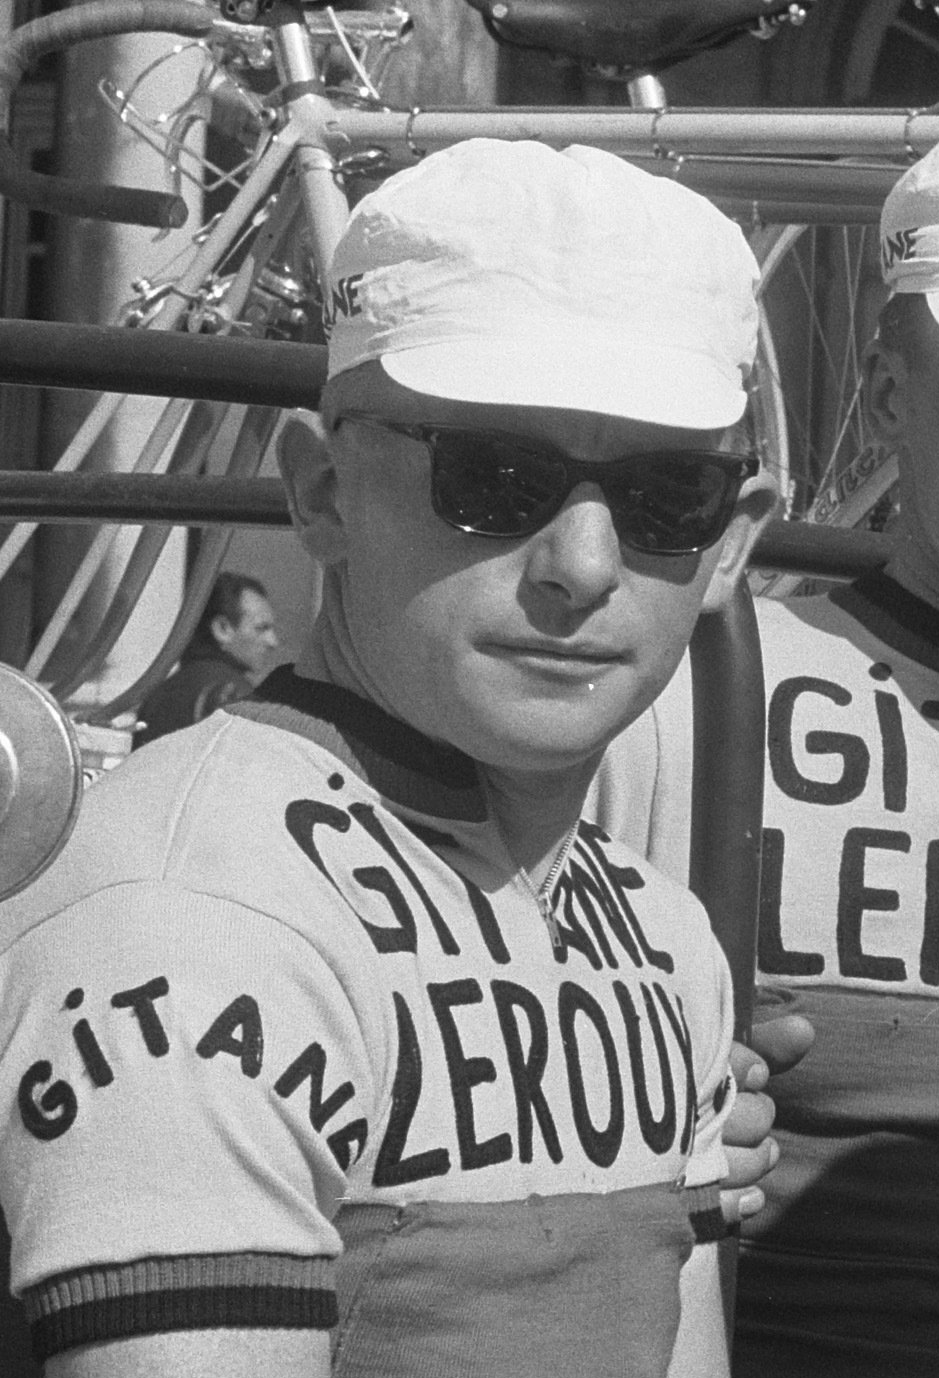 Gérard_Thiélin,_Tour_de_France_1962.jpg